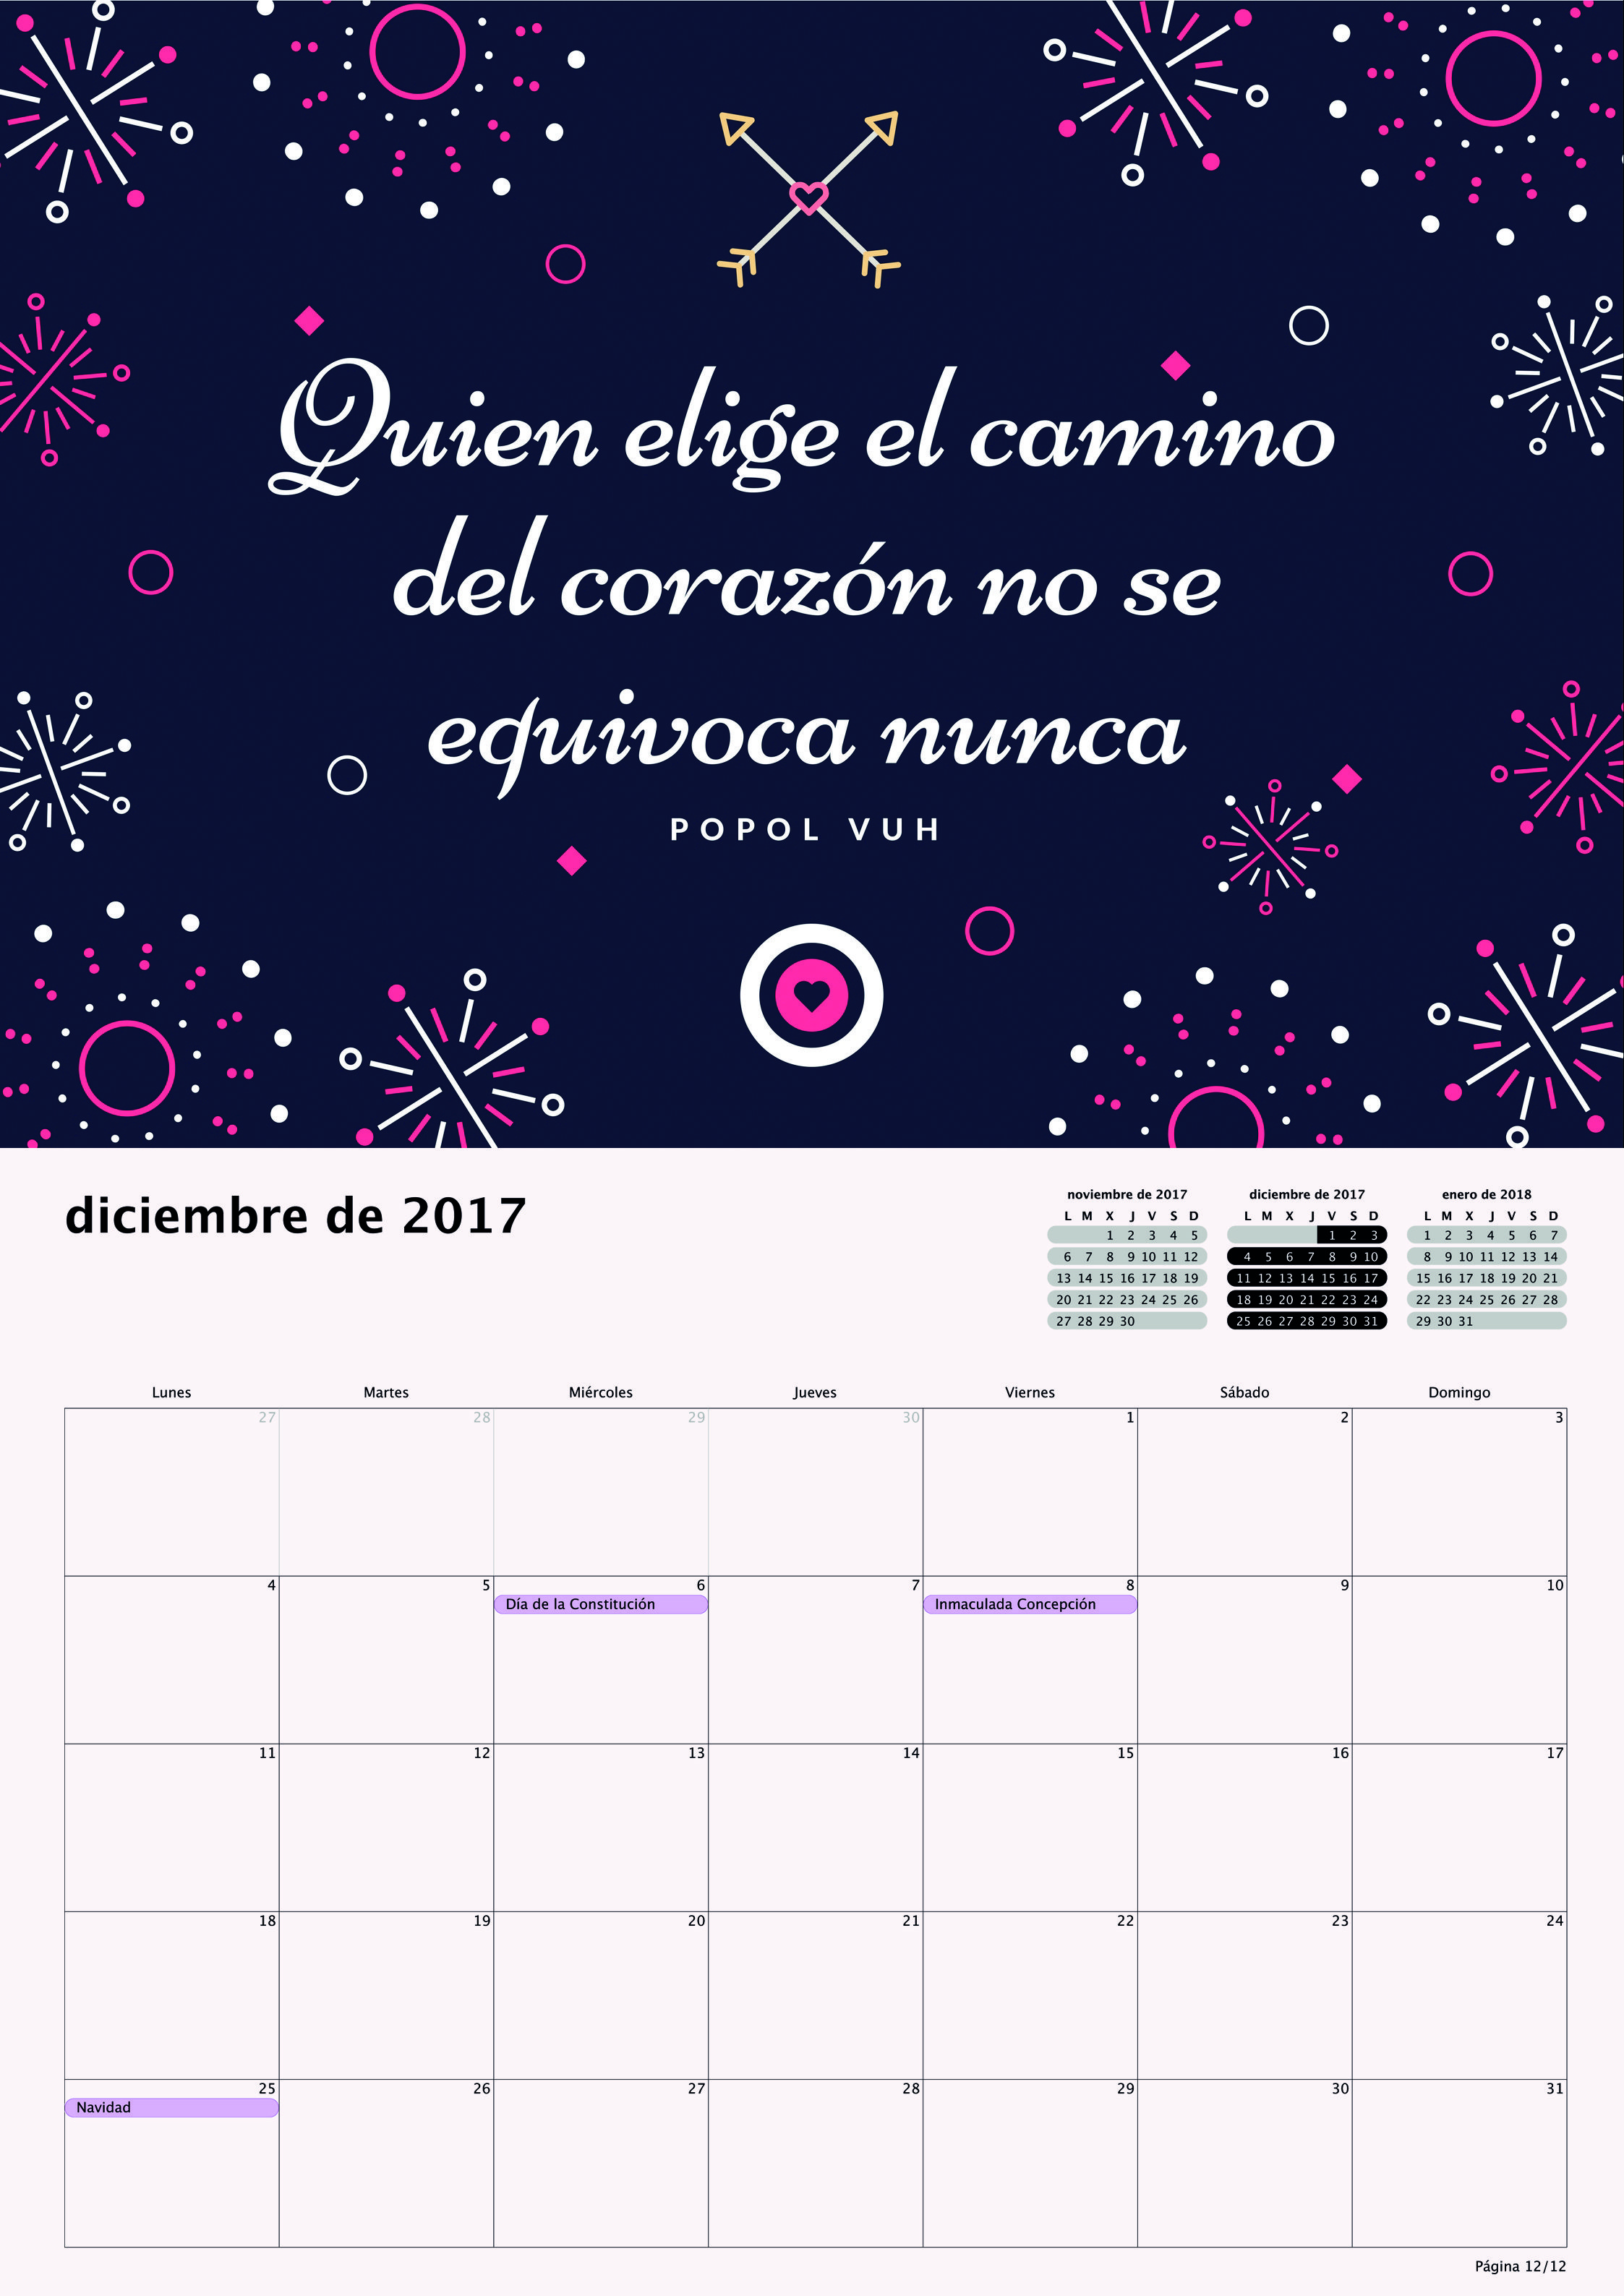 Calendario 2017 para Pequeños Saltamontes - Diciembre